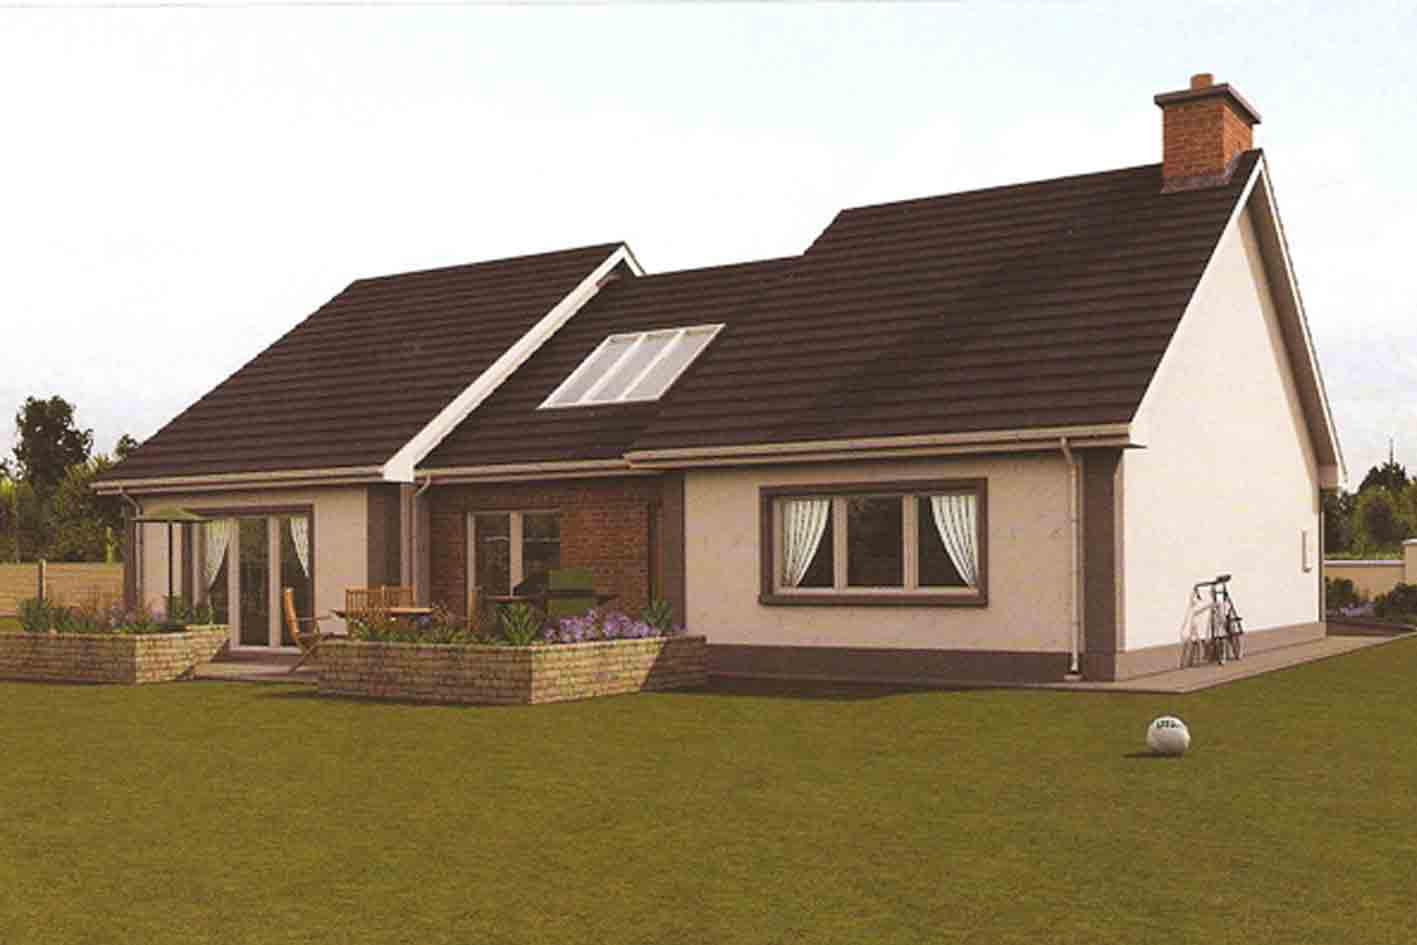 KILLINEY IRISH HOUSE